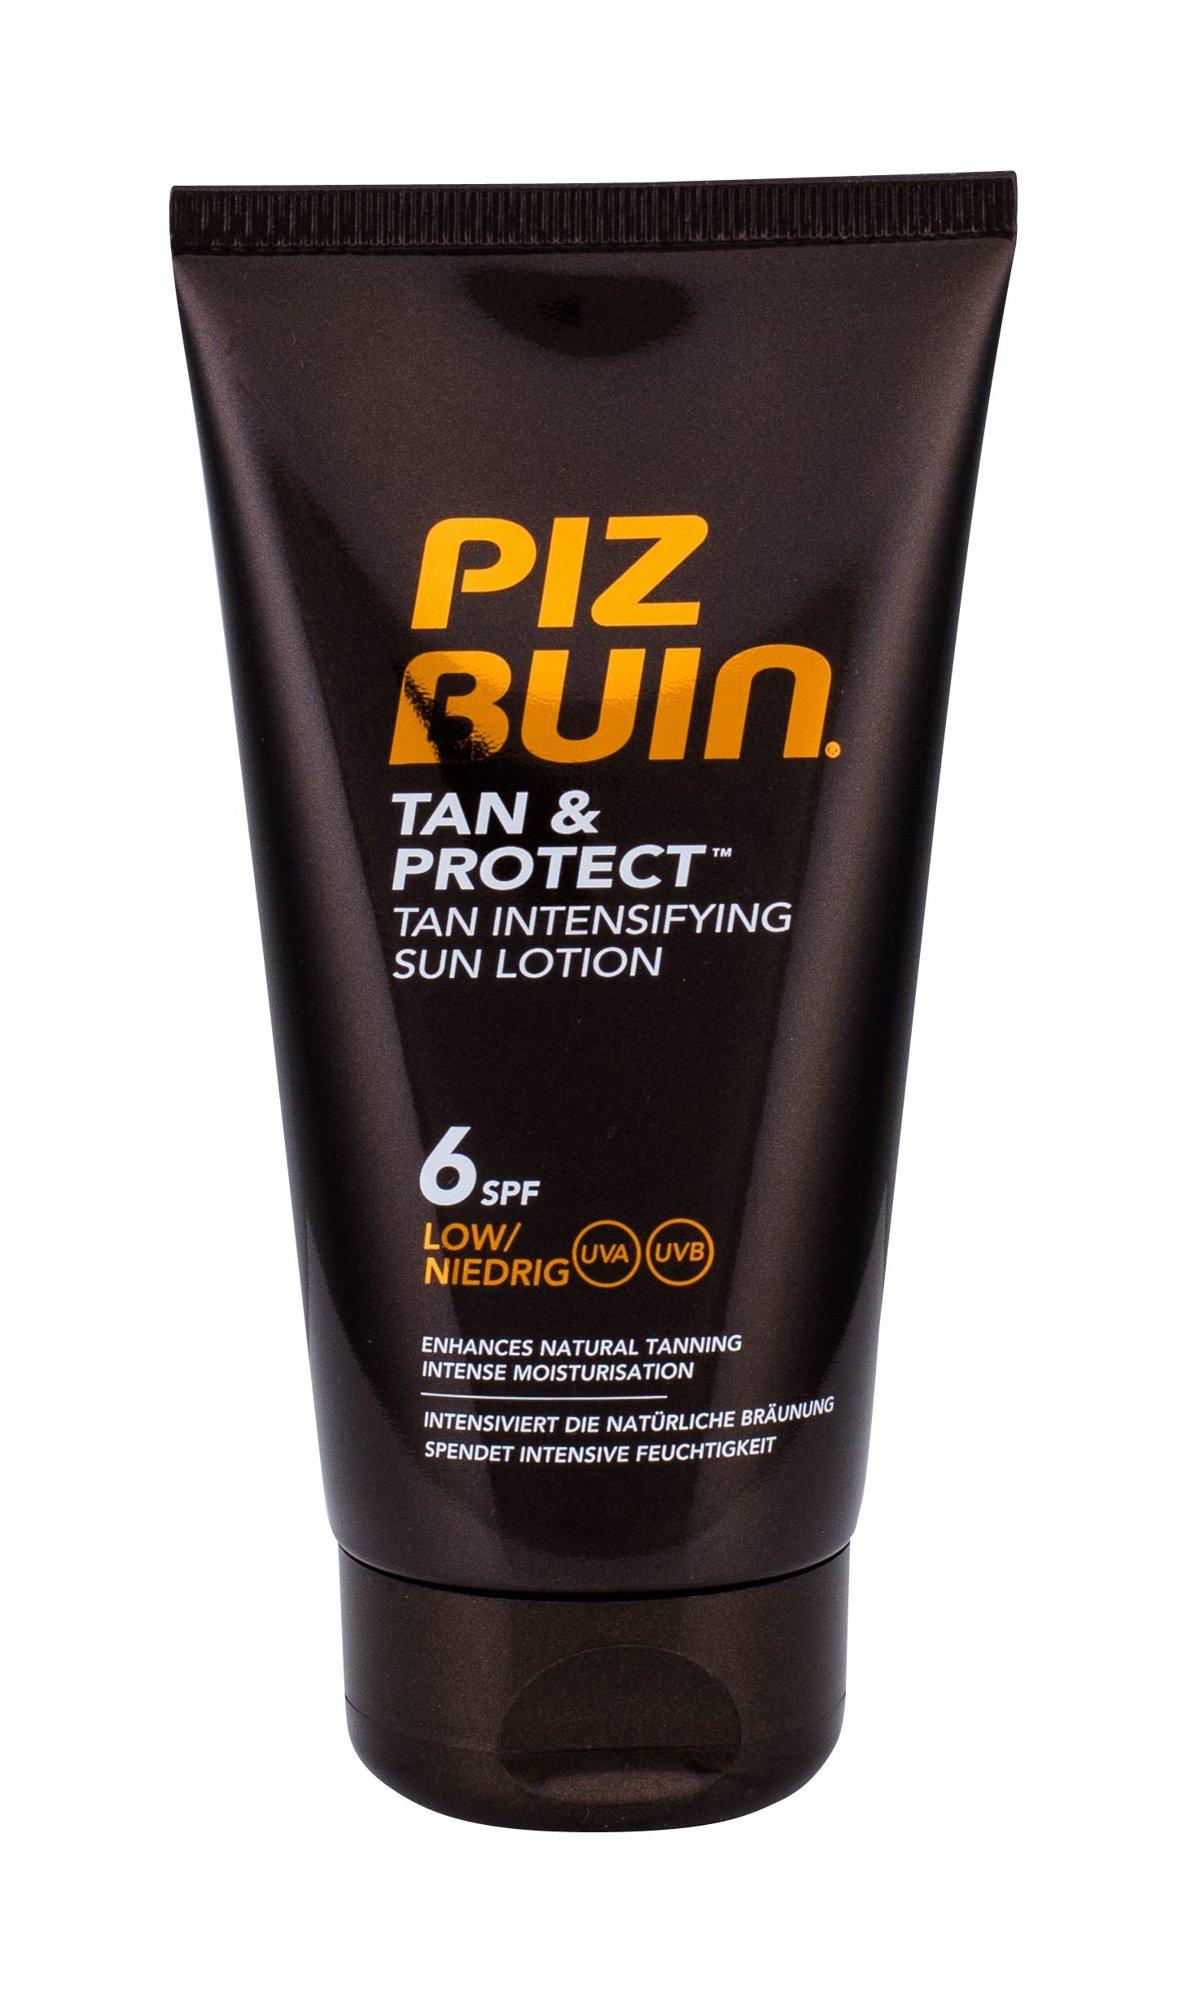 PIZ BUIN Tan & Protect Cosmetic 150ml  Tan Intensifying Sun Lotion